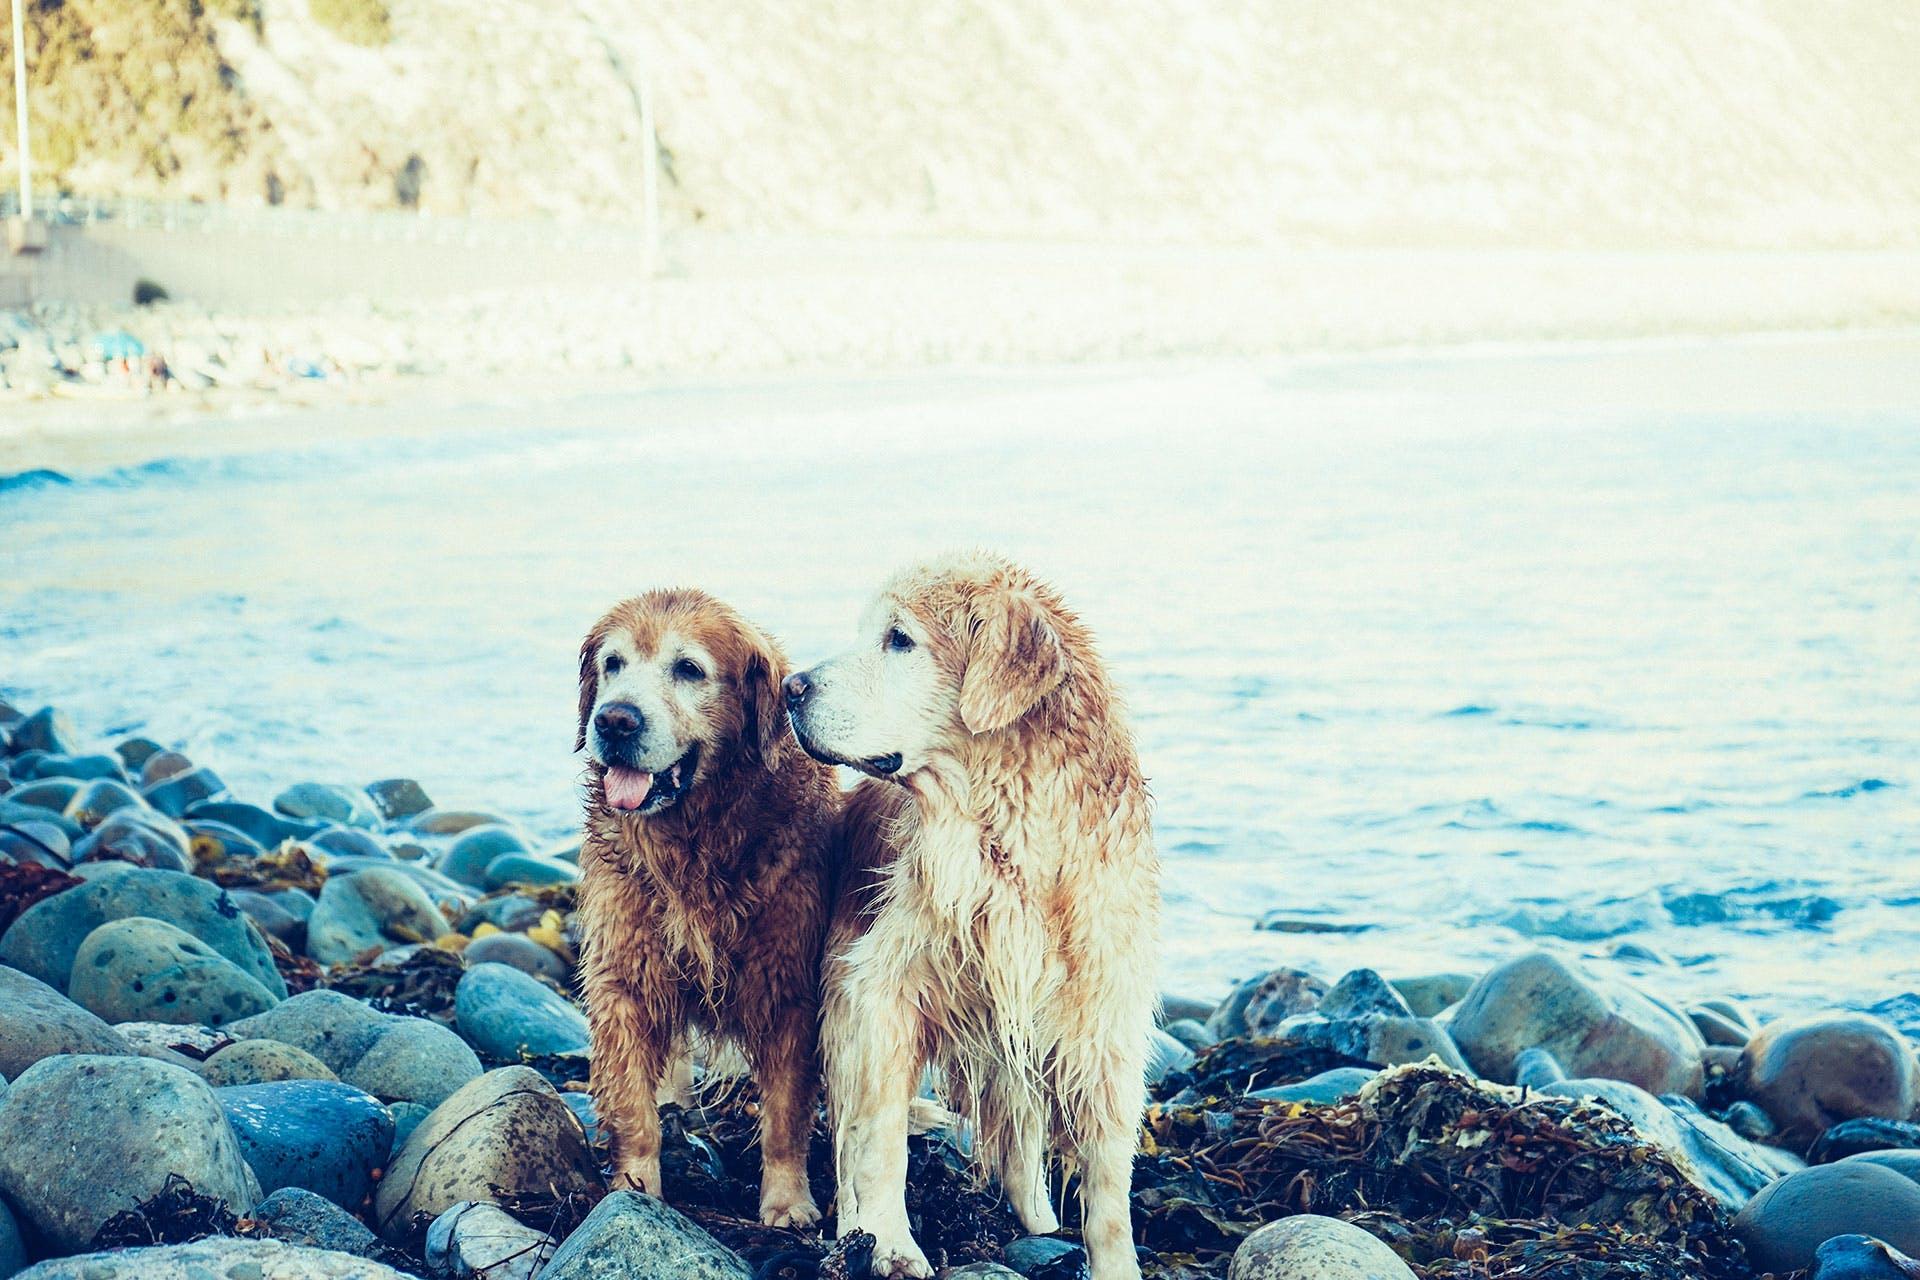 animals, dogs, lake